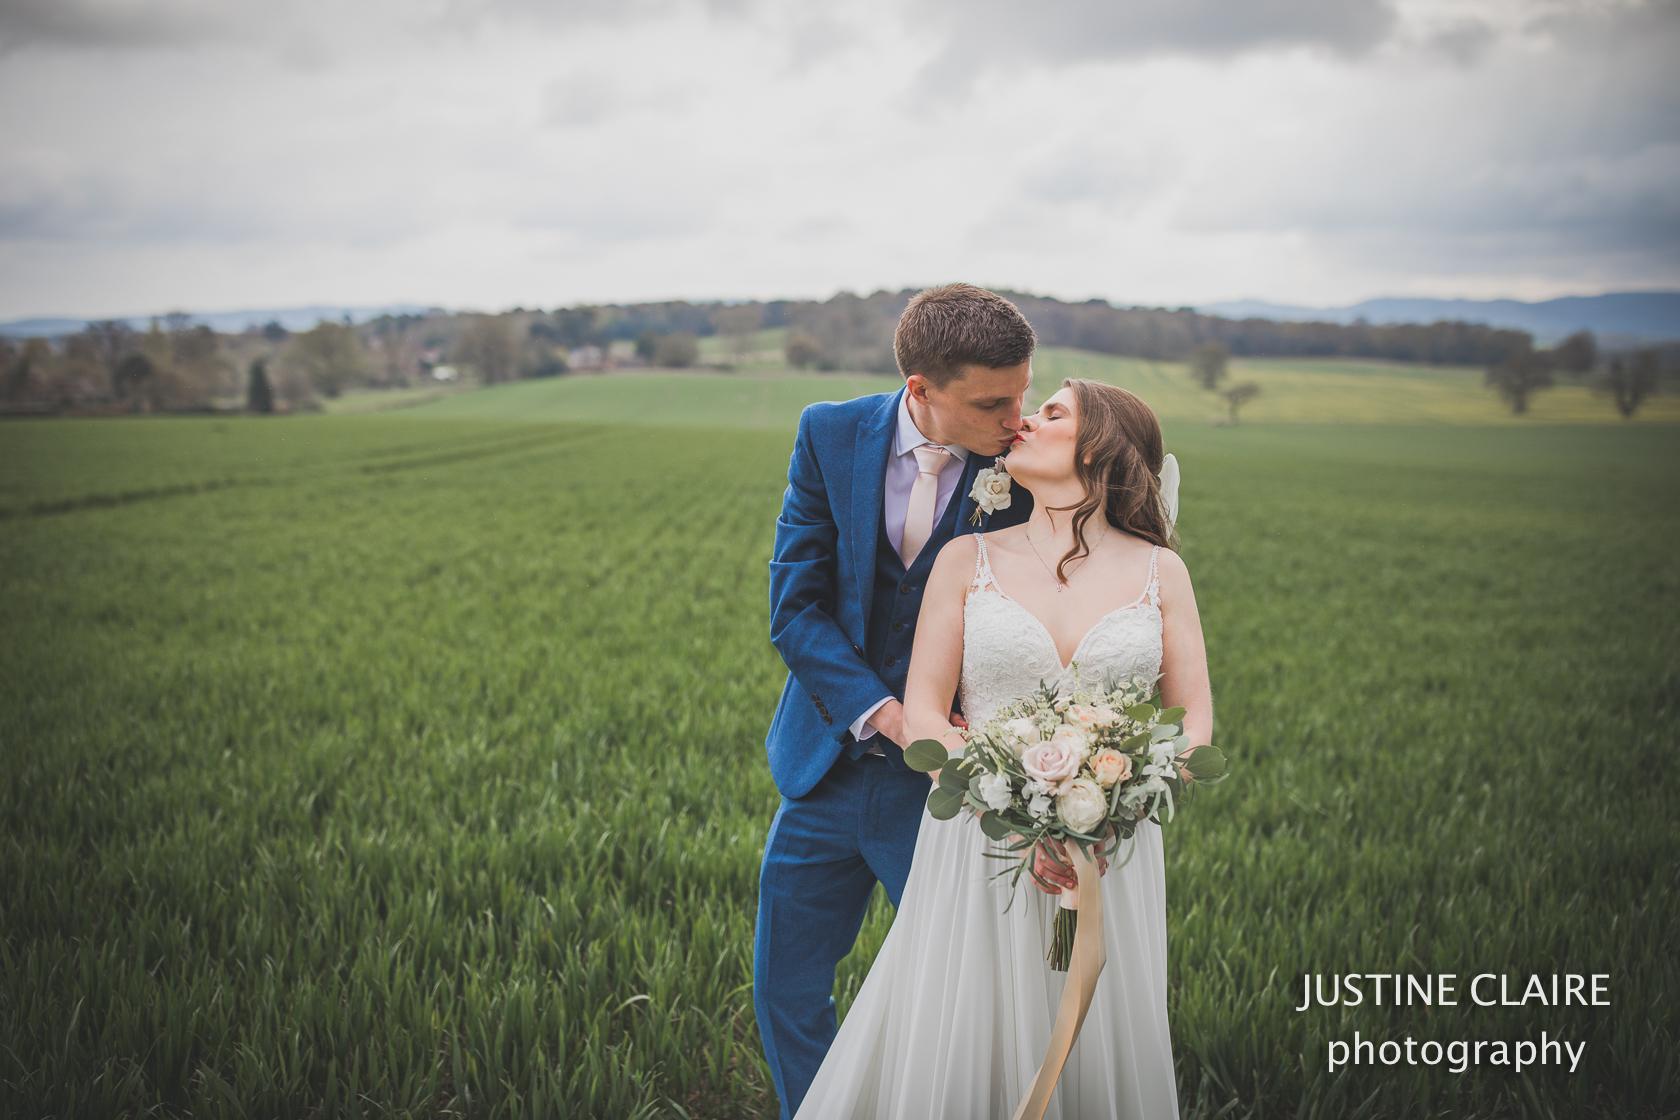 Fitzleroi Fittleworth petworth Billingshurst farm Wedding Photography by Justine Claire photographer Arundel Worthing Brighton-49.jpg